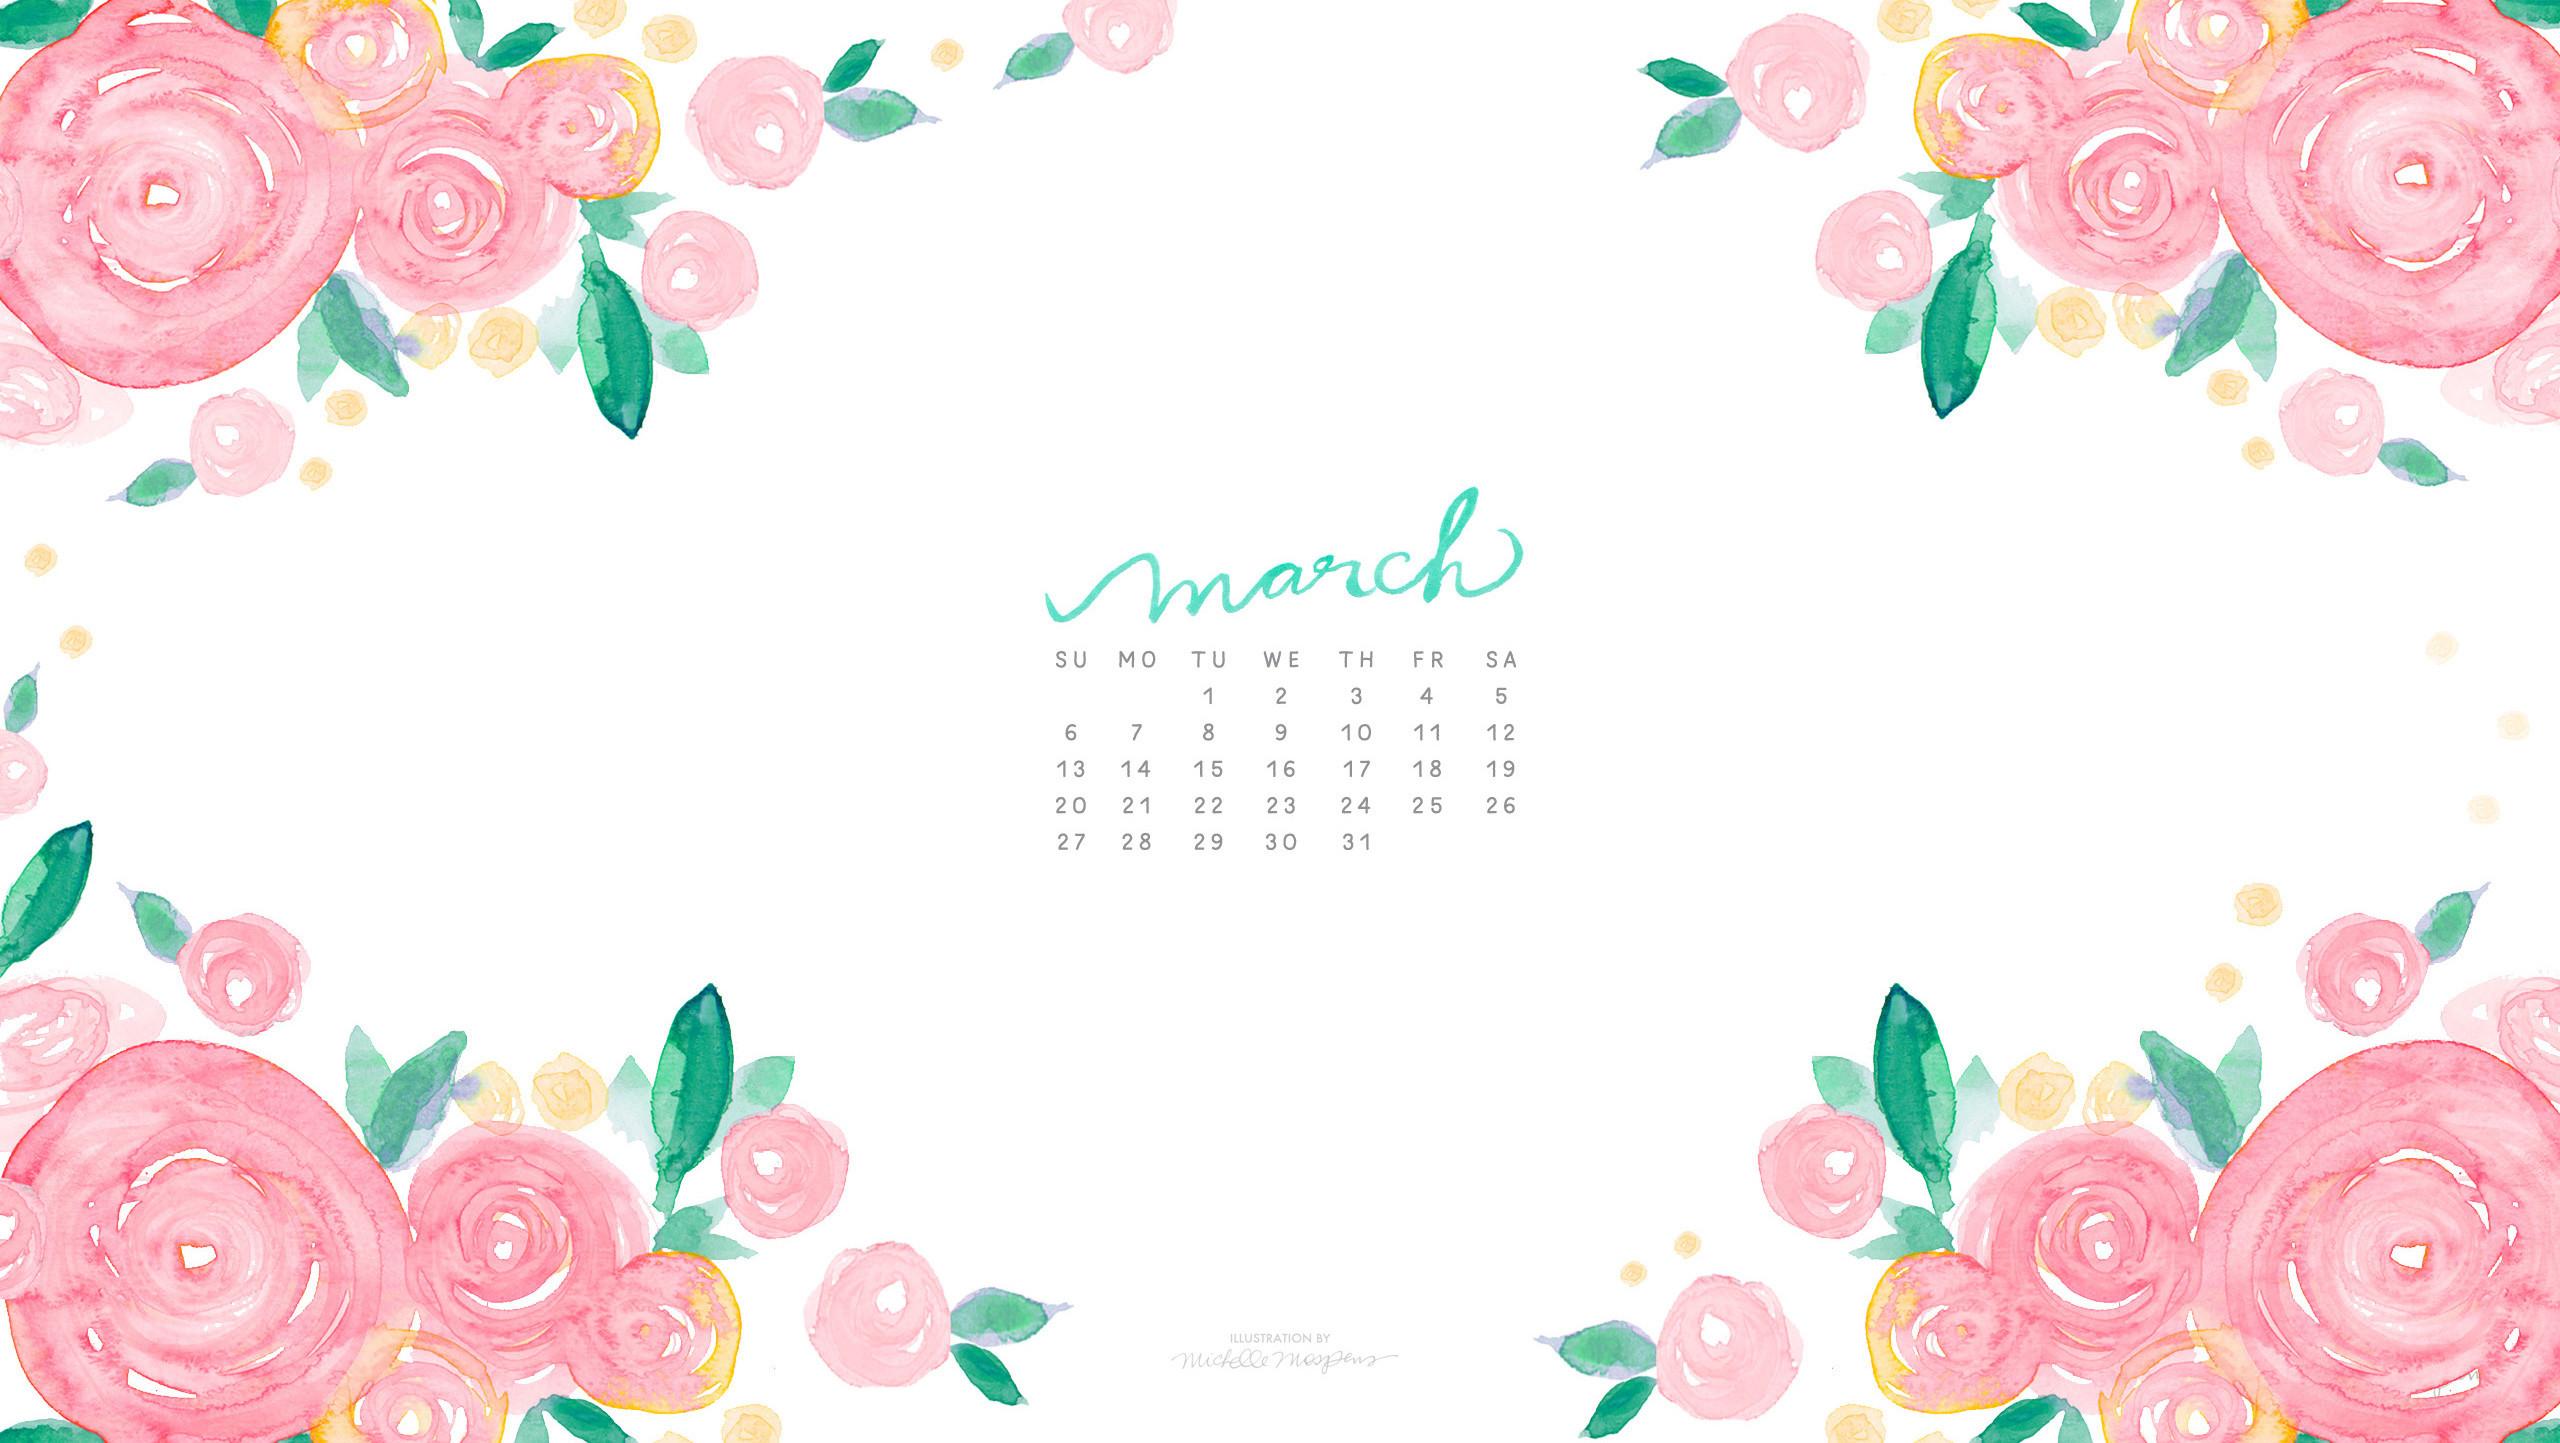 March Watercolor Floral Calendar Download for your computer desktop by  Michelle Mospens. /